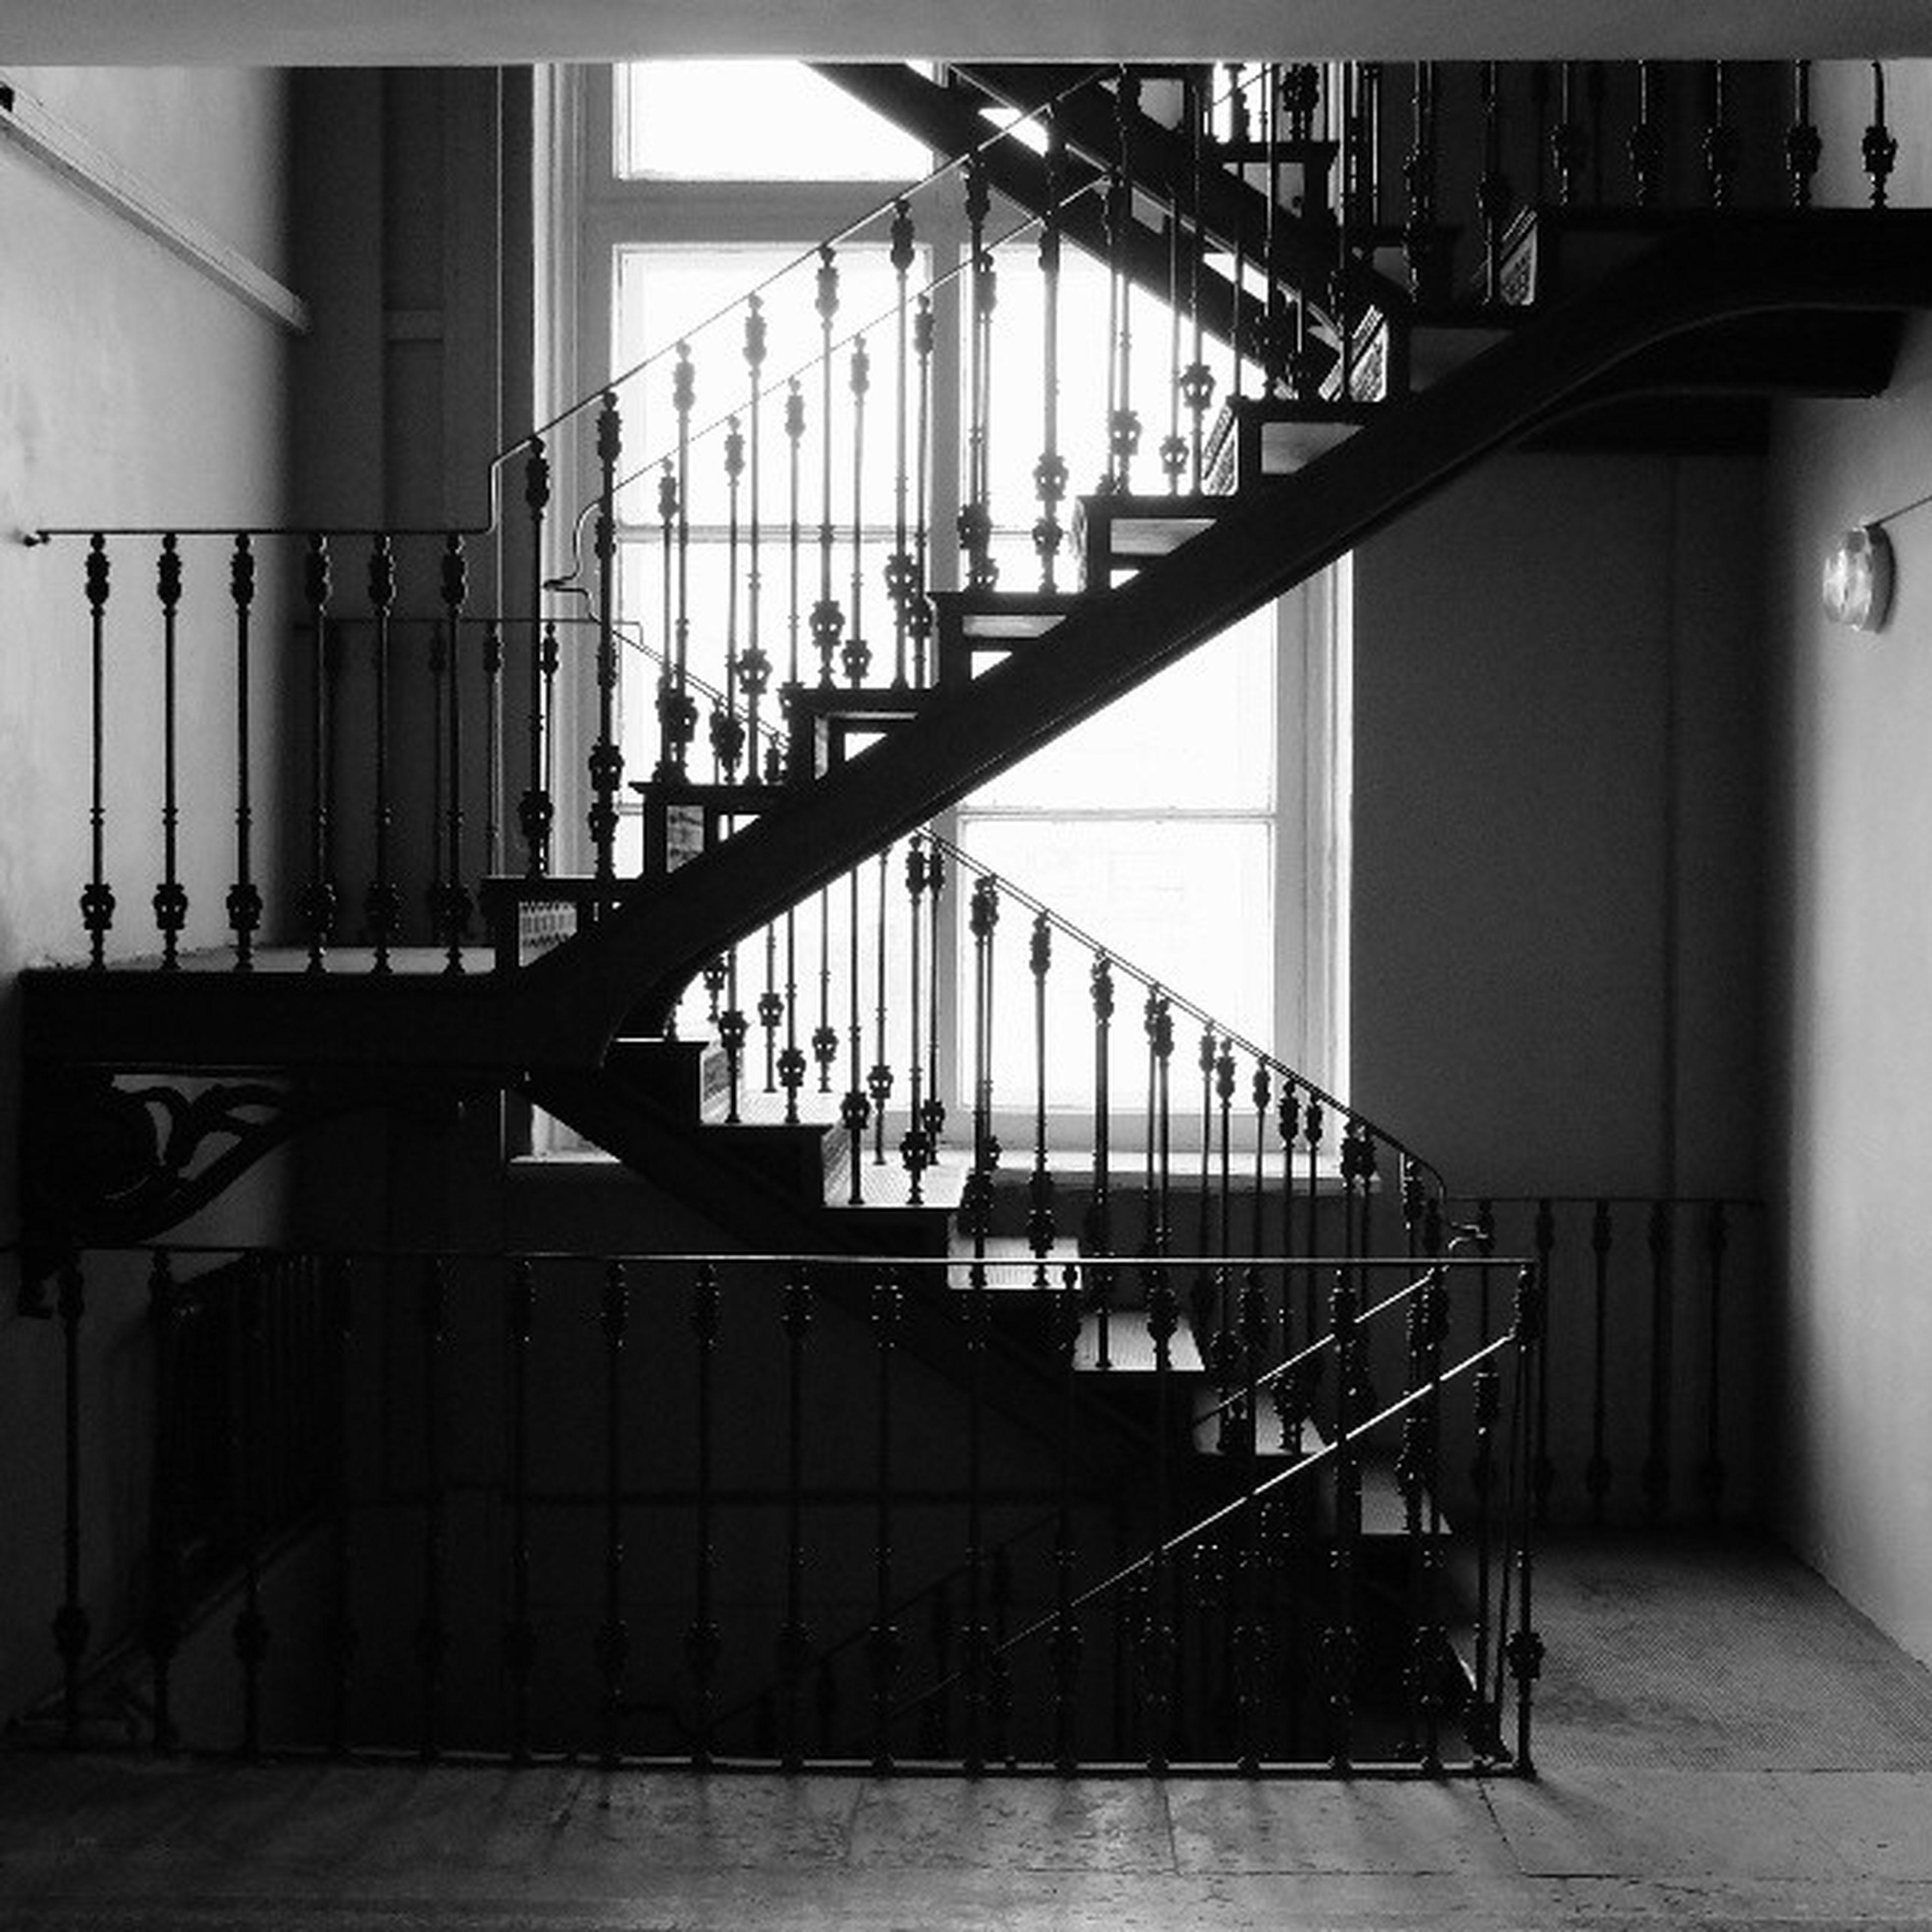 Да, эта лестница особо графична ))) чернобелое графично чб окно blackandwhite bnw monochrome stairs academyoffinearts window contrasts fujifilm_xseries fujifilmx20 fujifilm